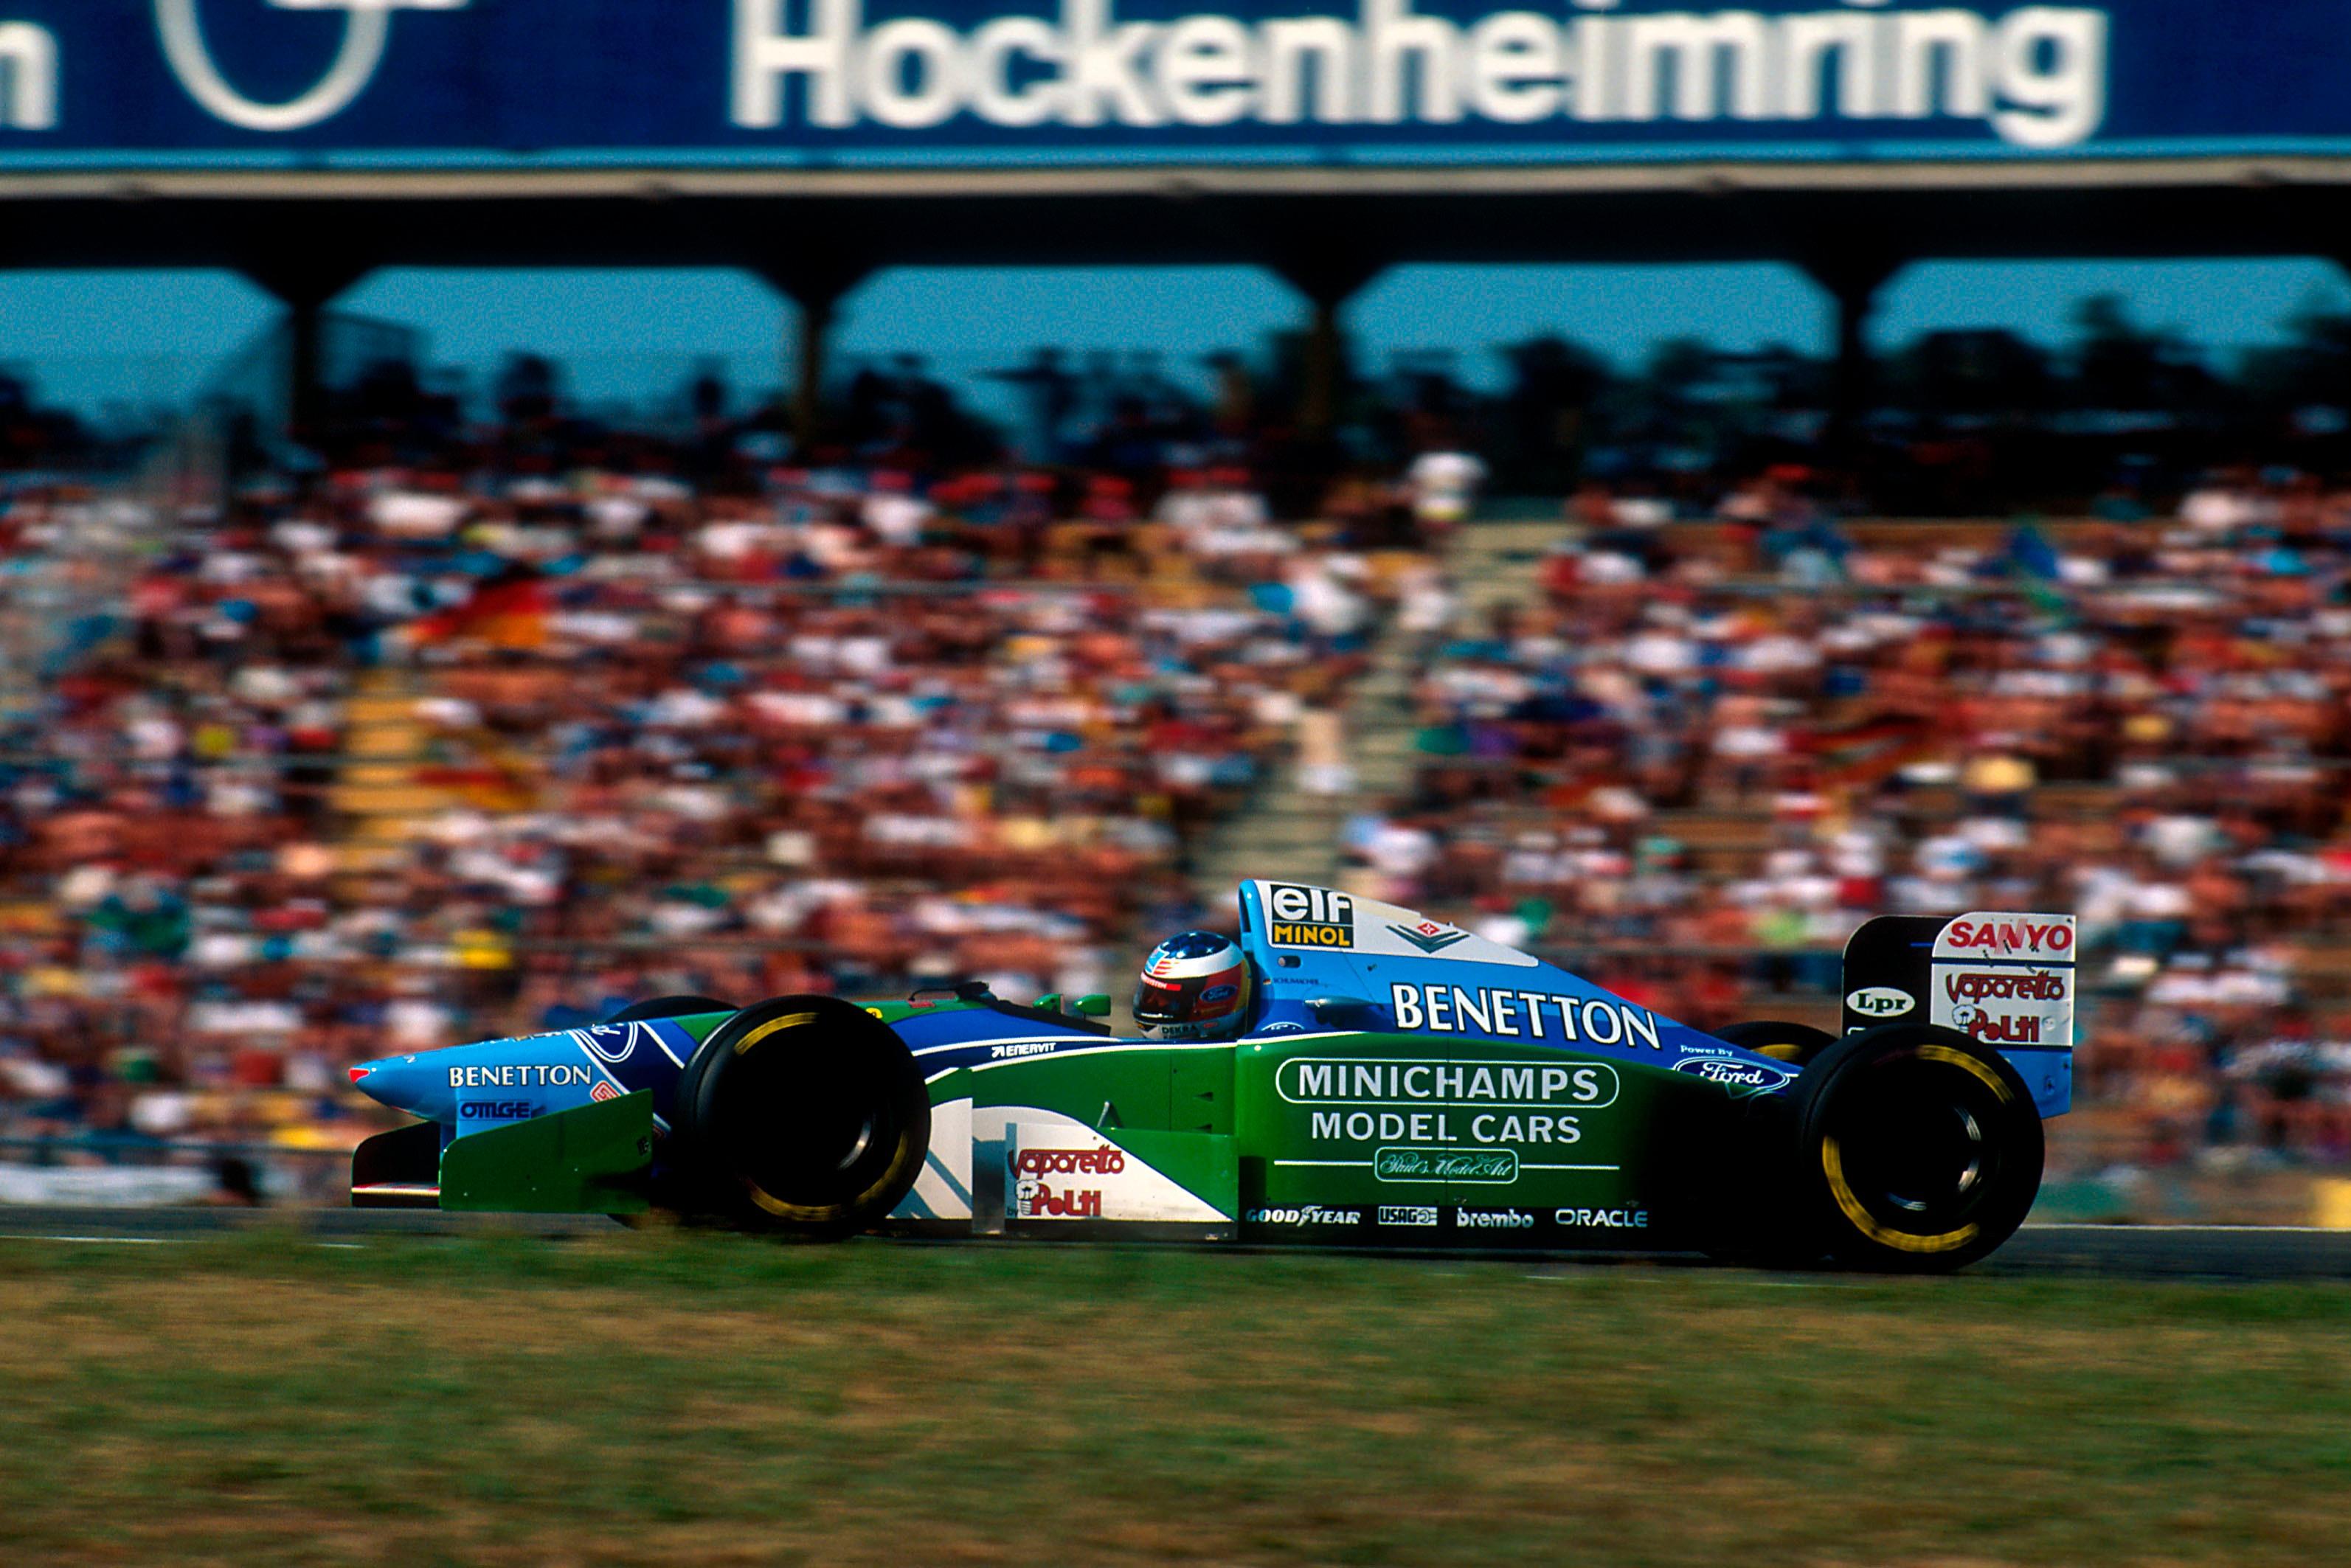 Schumacher's engine failure meant the Benetton mechanics could get proper treatment for their burns